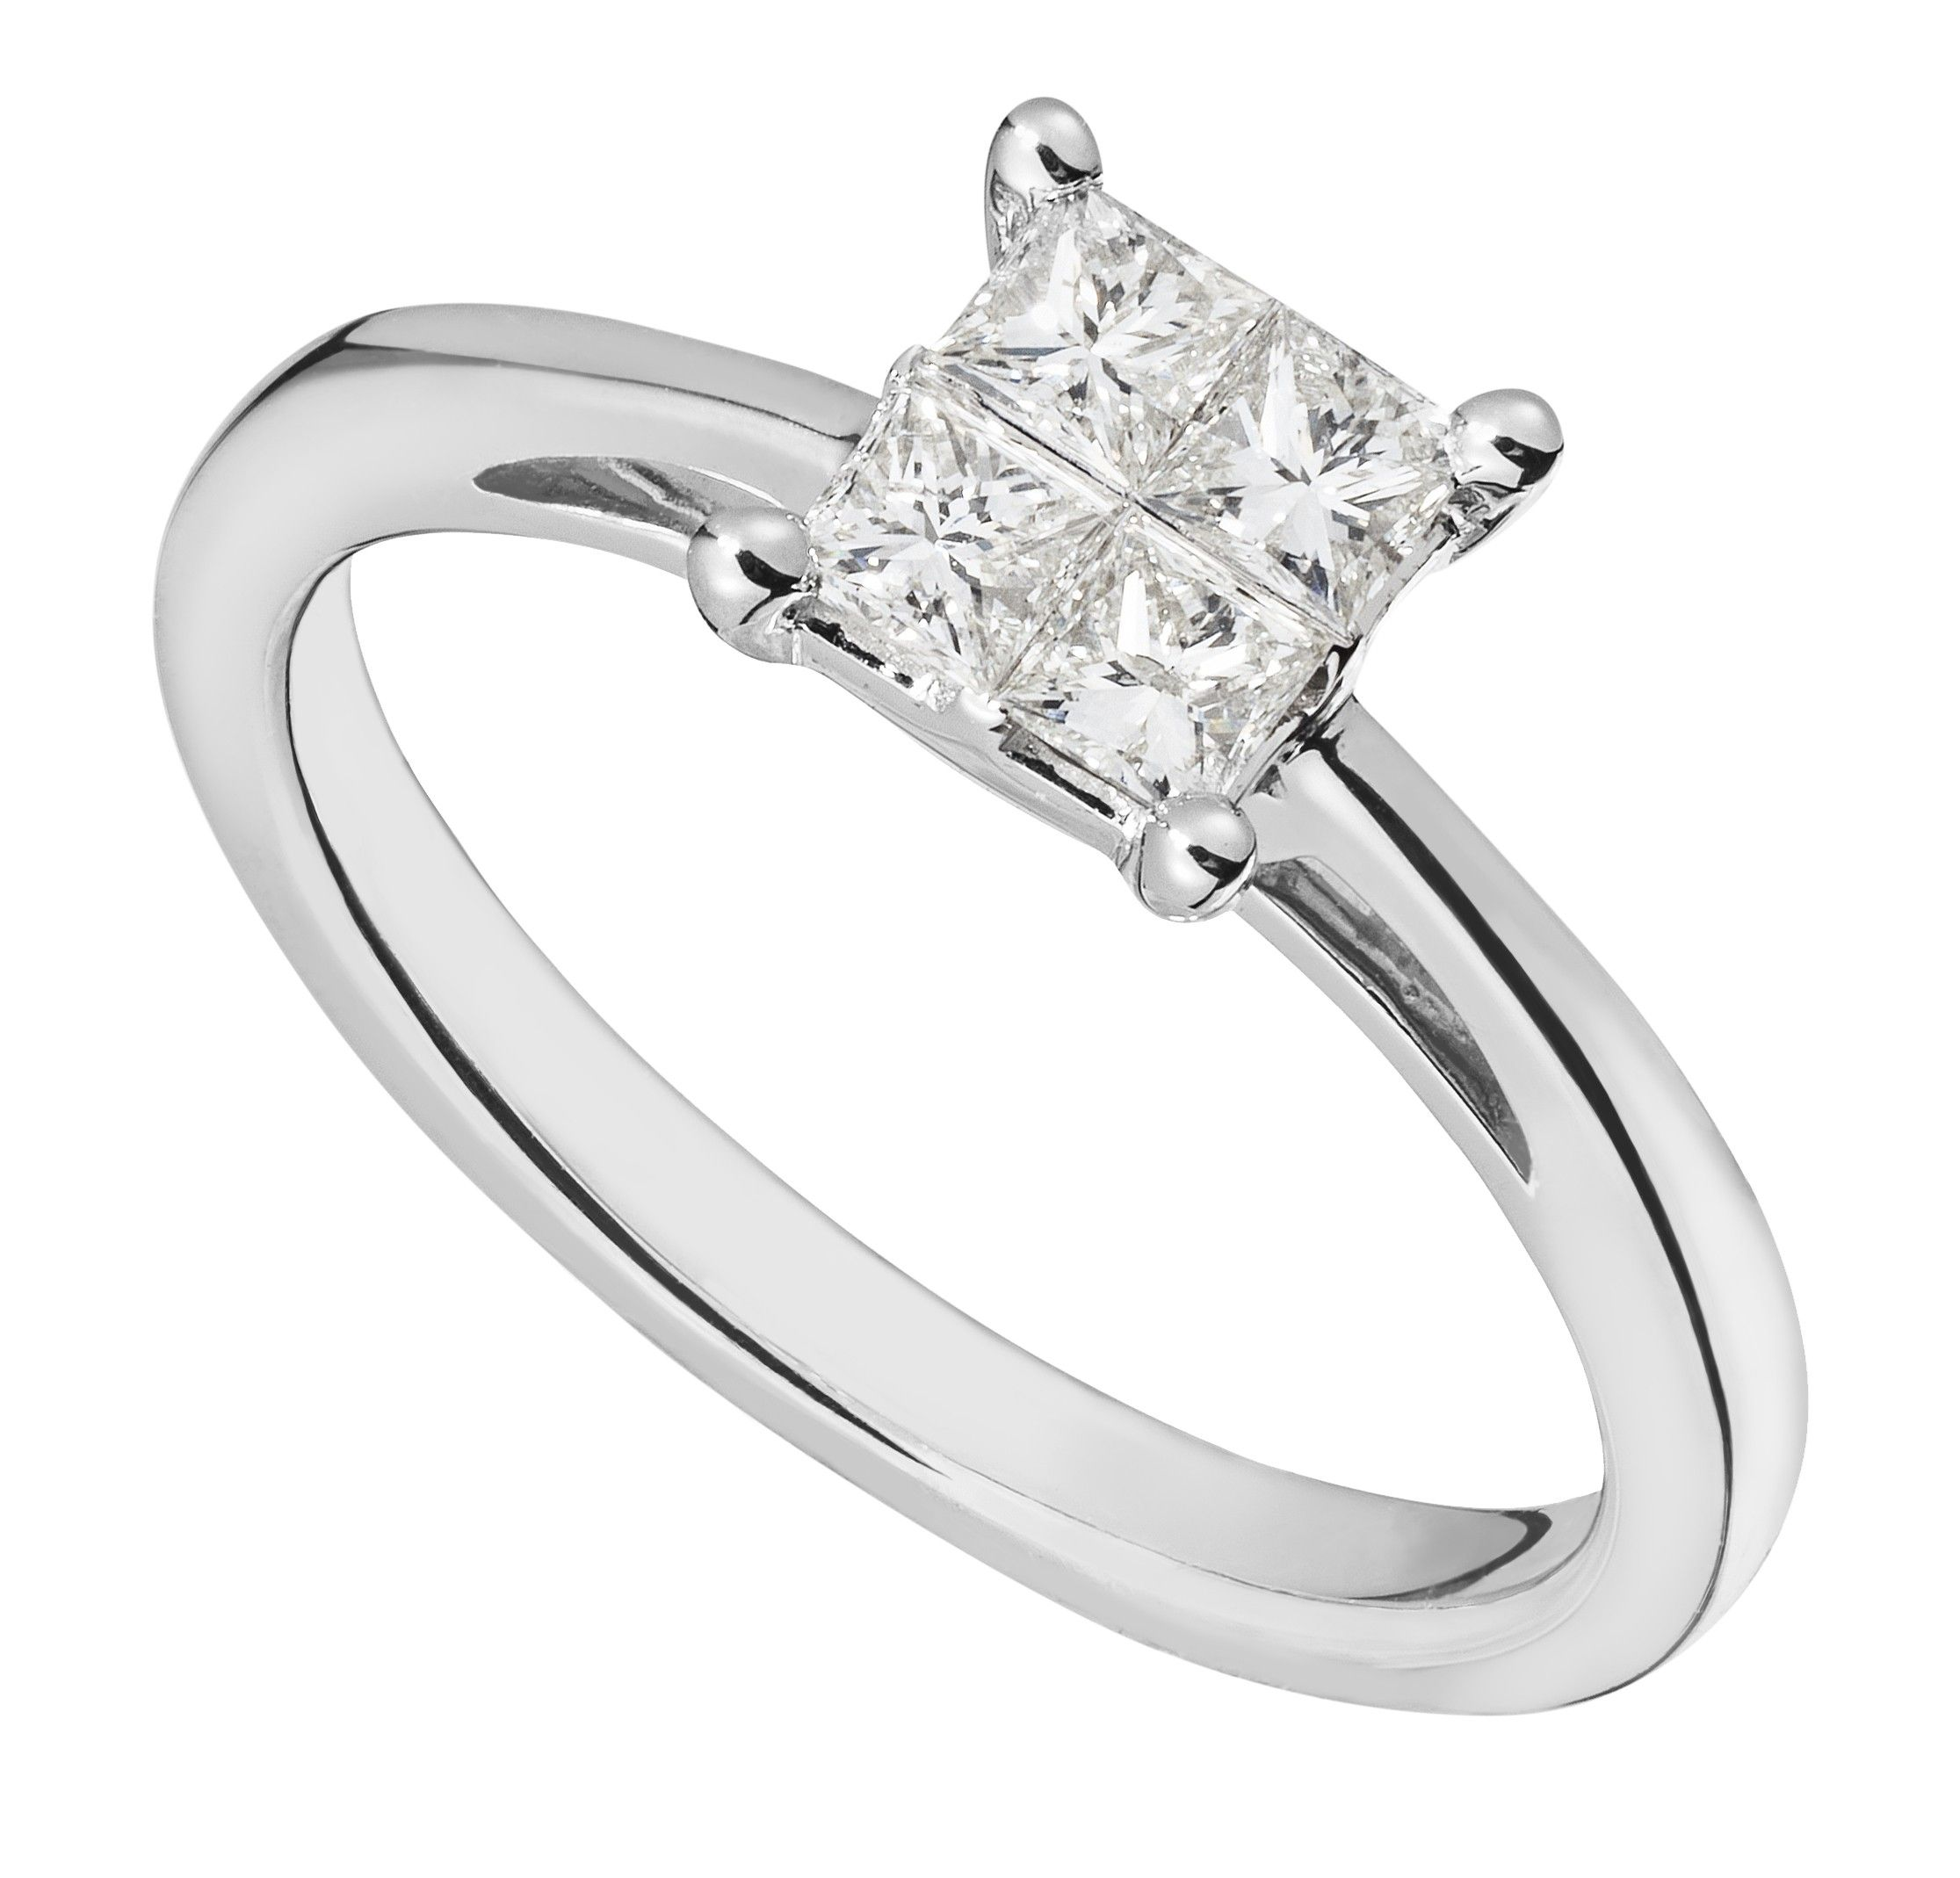 Engagement Ring Guide Diamond Size Comparison Rounddiamondengagementrings Dream Engagement Rings Engagement Ring Guide Perfect Engagement Ring